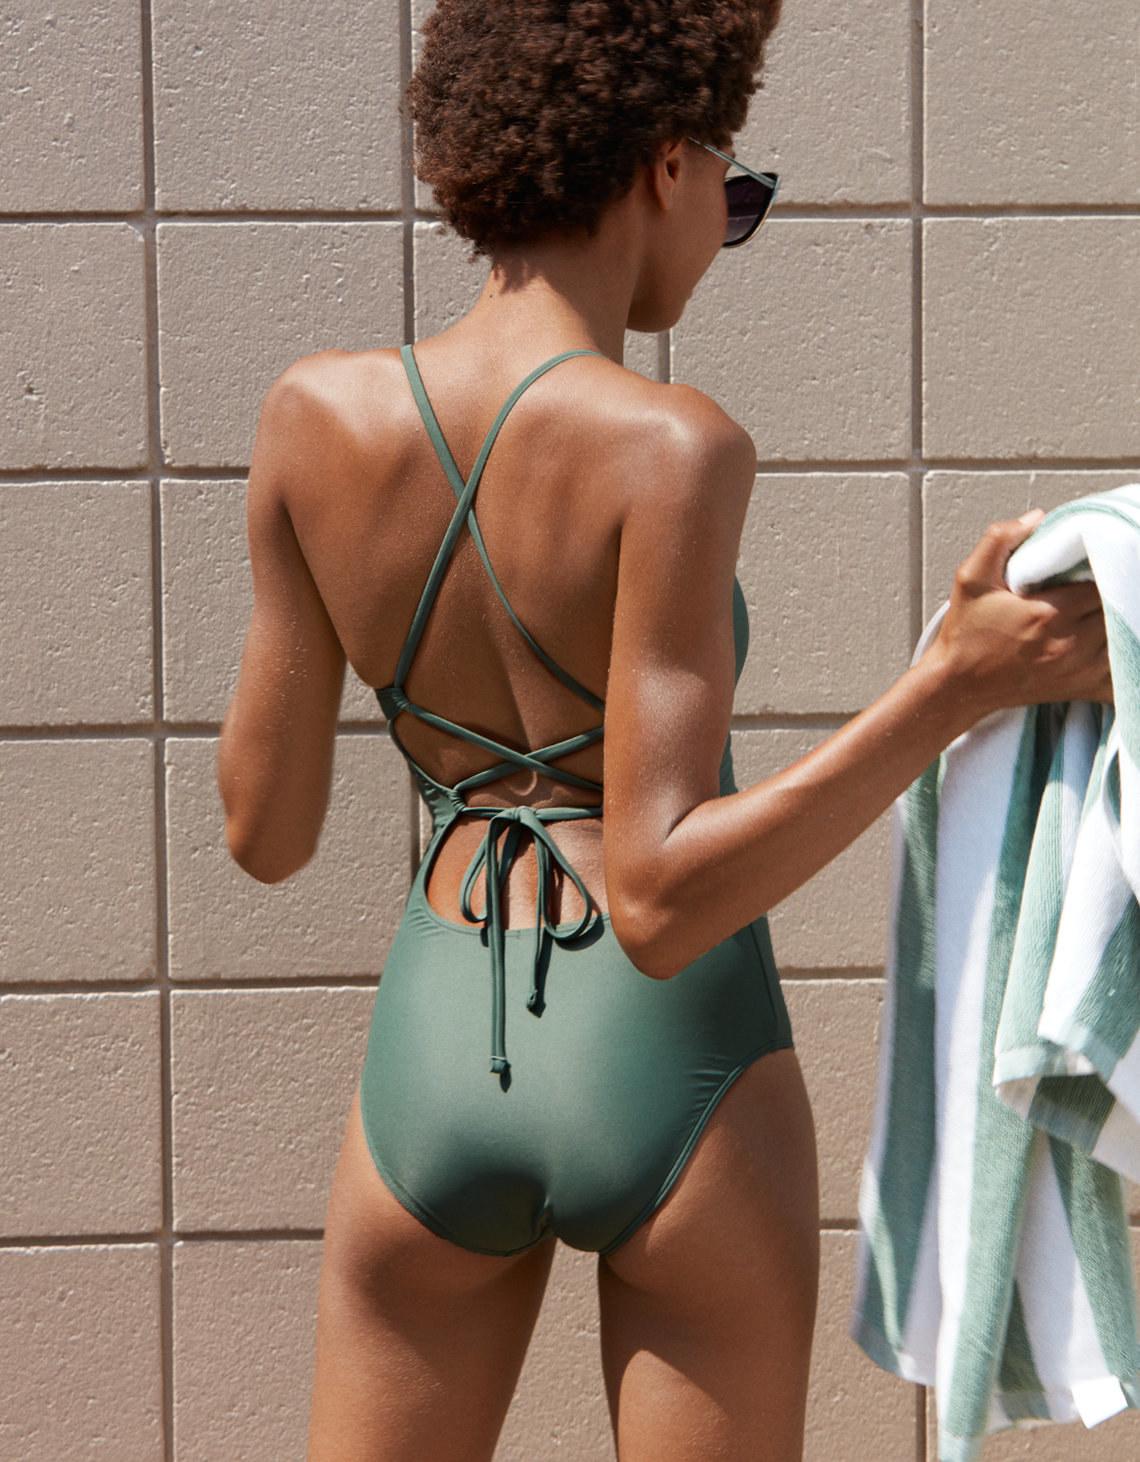 suit remove spank piece bathing One